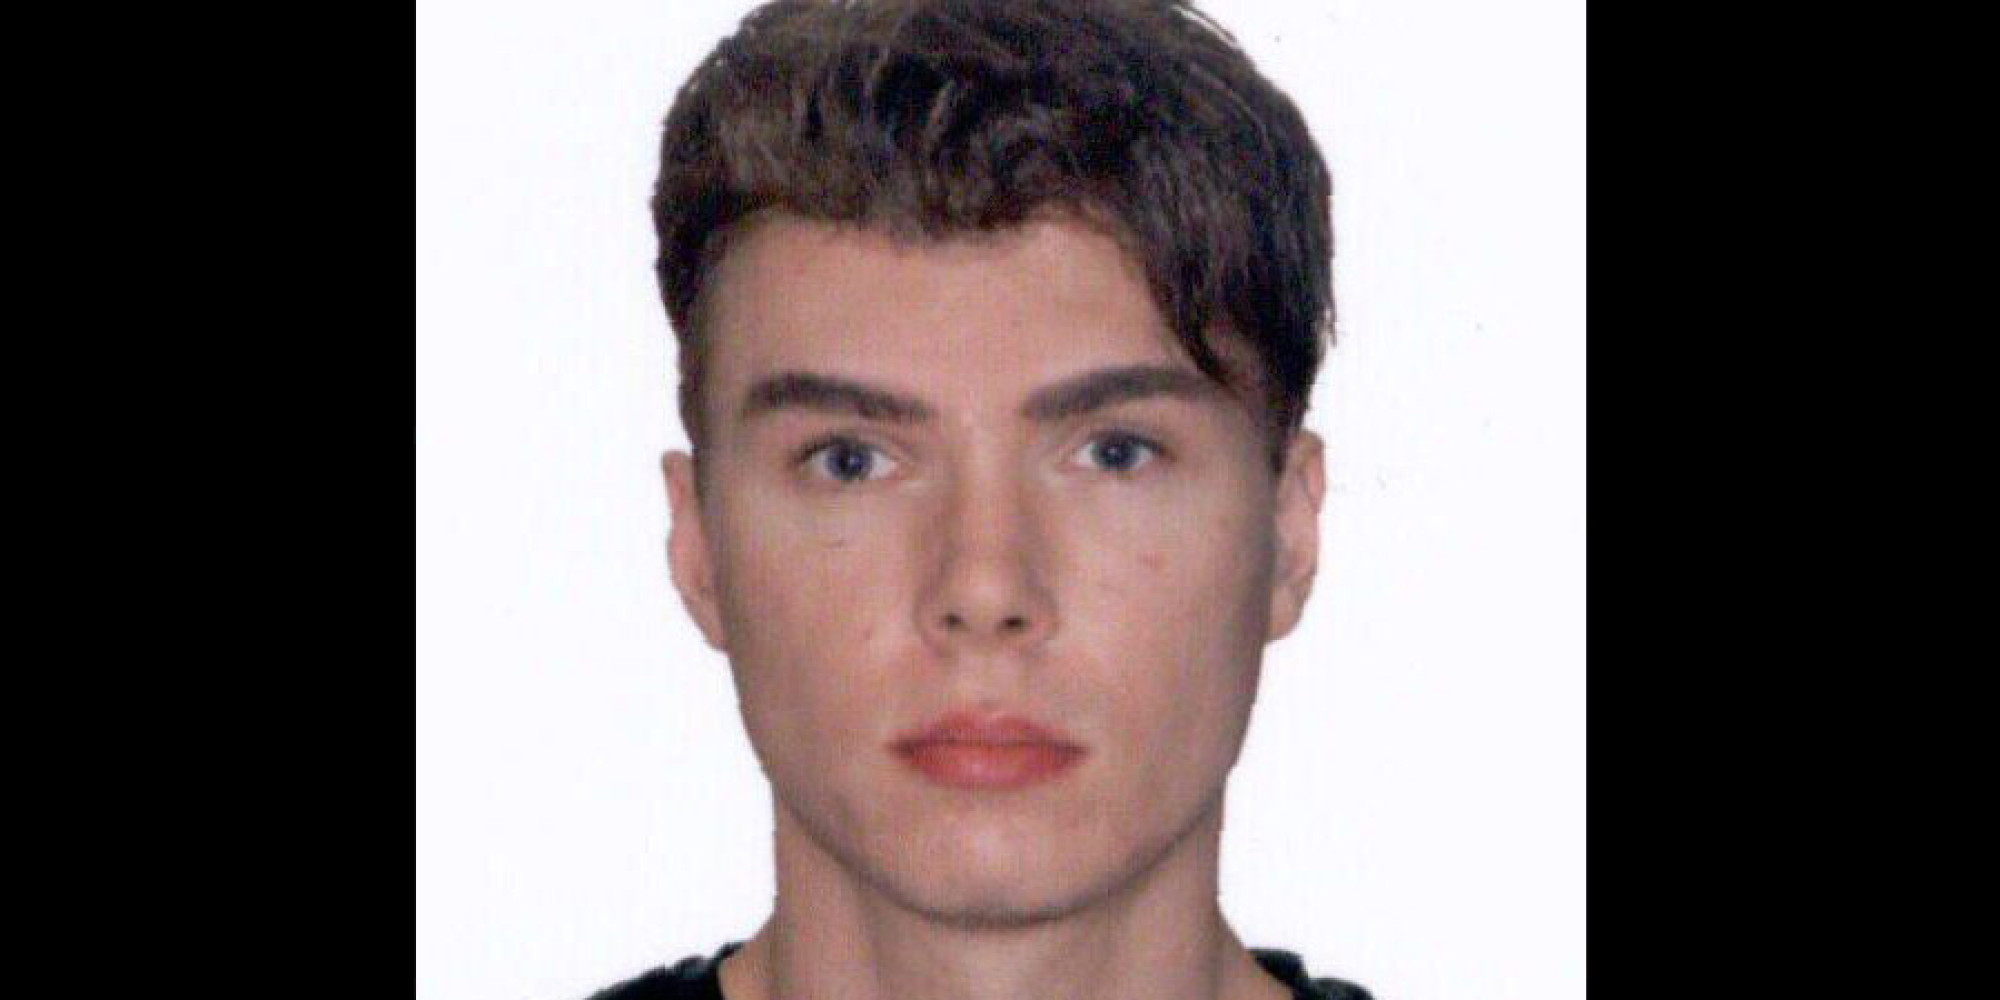 Luka Magnotta Murder Trial: Hubert Chretien, Son Of Ex-PM ... Karla Homolka Luka Magnotta